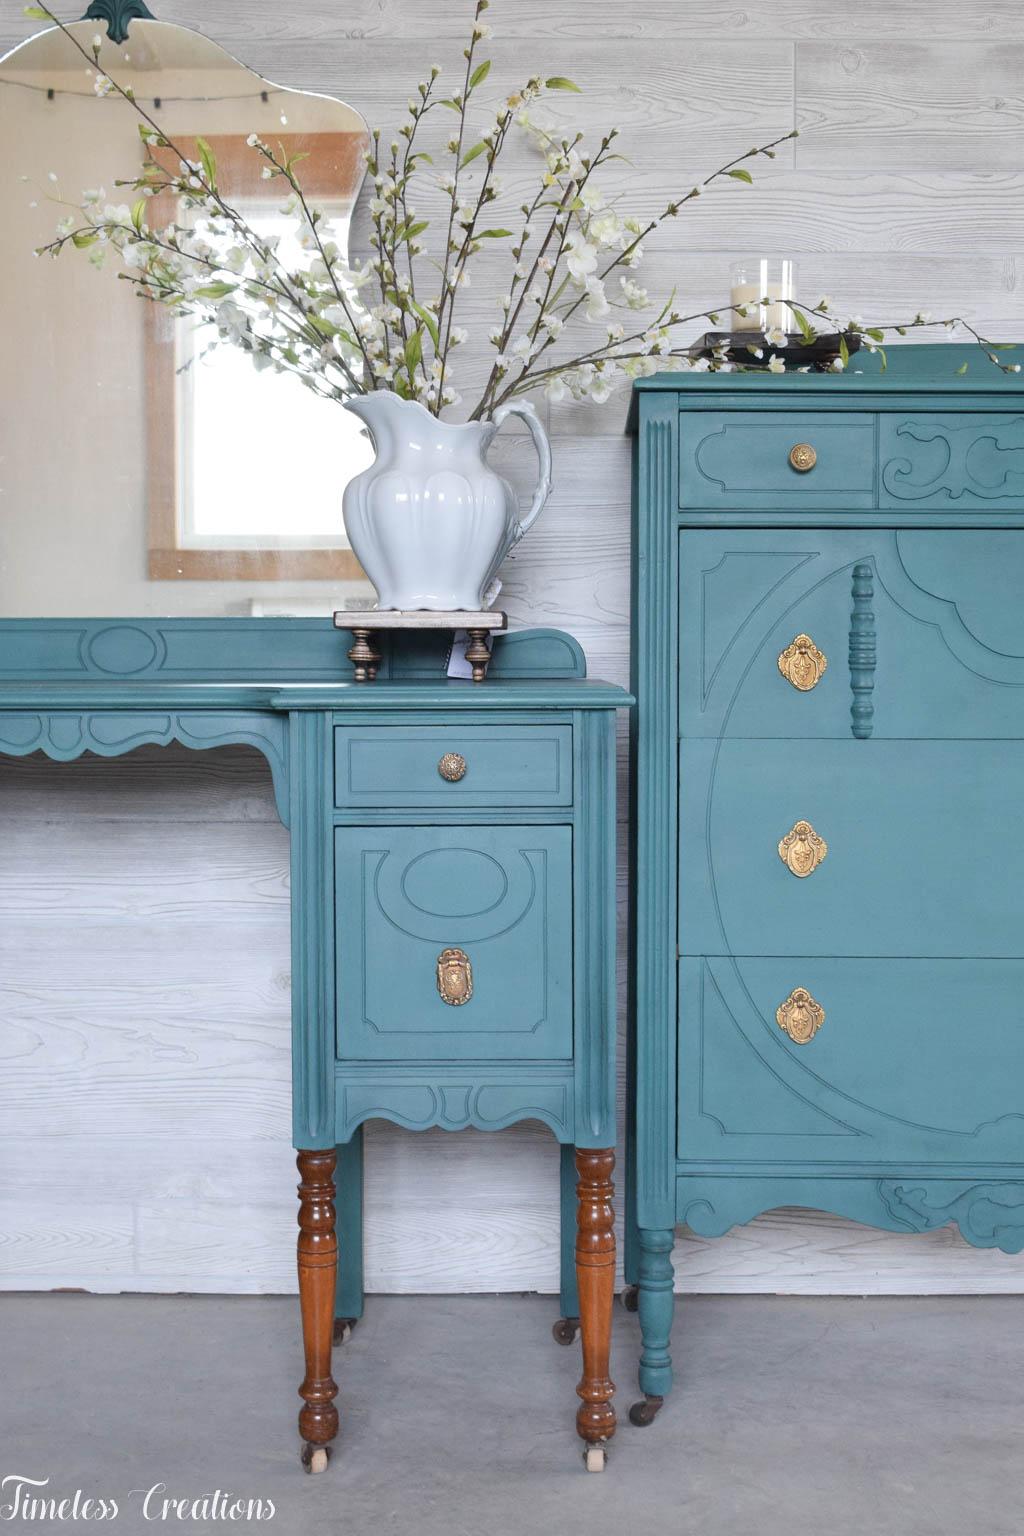 Sensational Antique Dresser Free Shipping Timeless Creations Llc Pabps2019 Chair Design Images Pabps2019Com